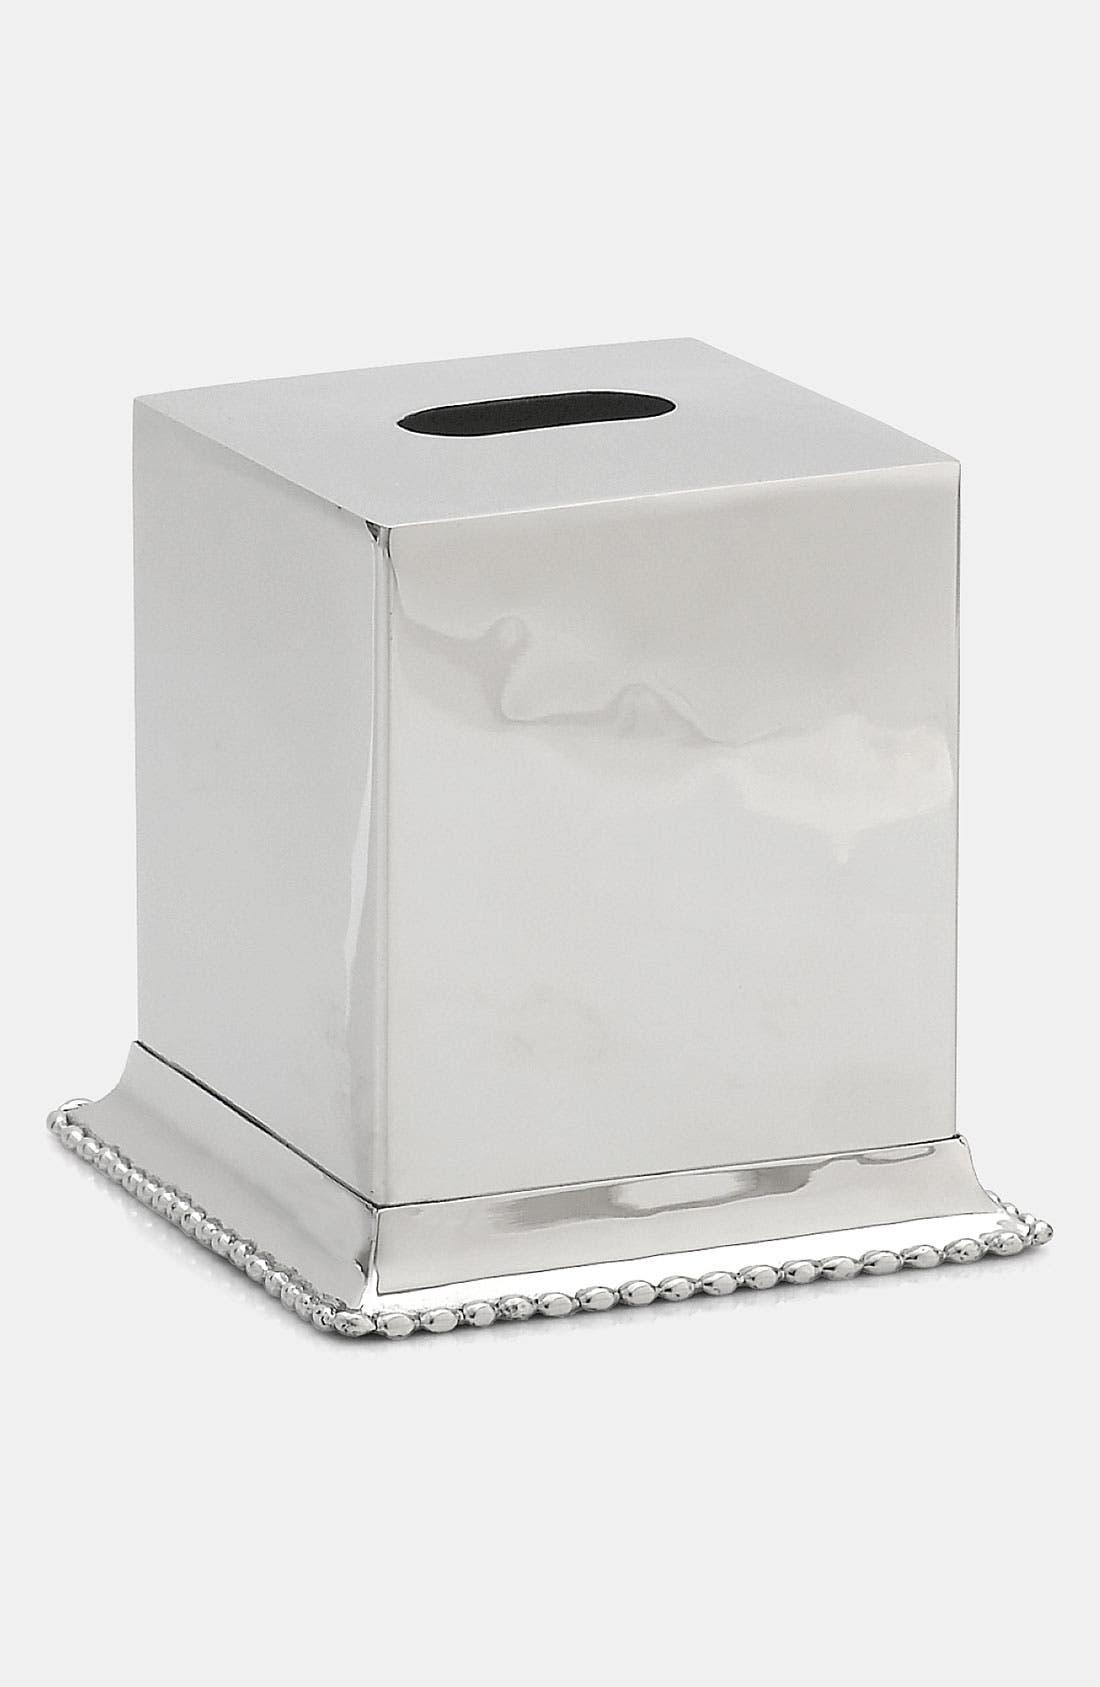 Alternate Image 1 Selected - Michael Aram 'New Molten' Tissue Box